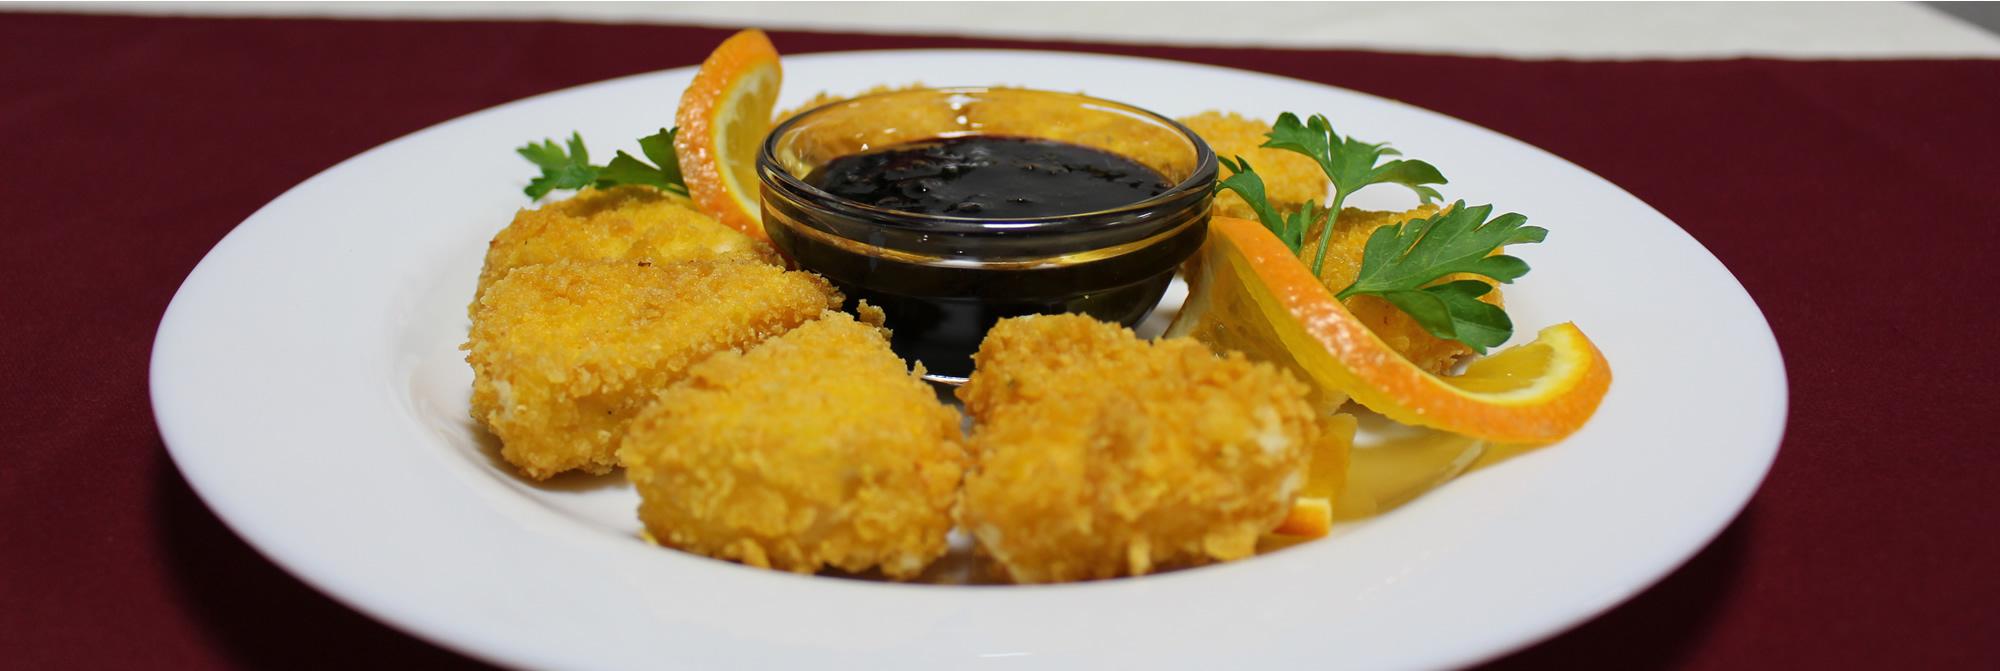 http://complexmagura.com/wp-content/uploads/2016/03/restaurant-sirenca.jpg